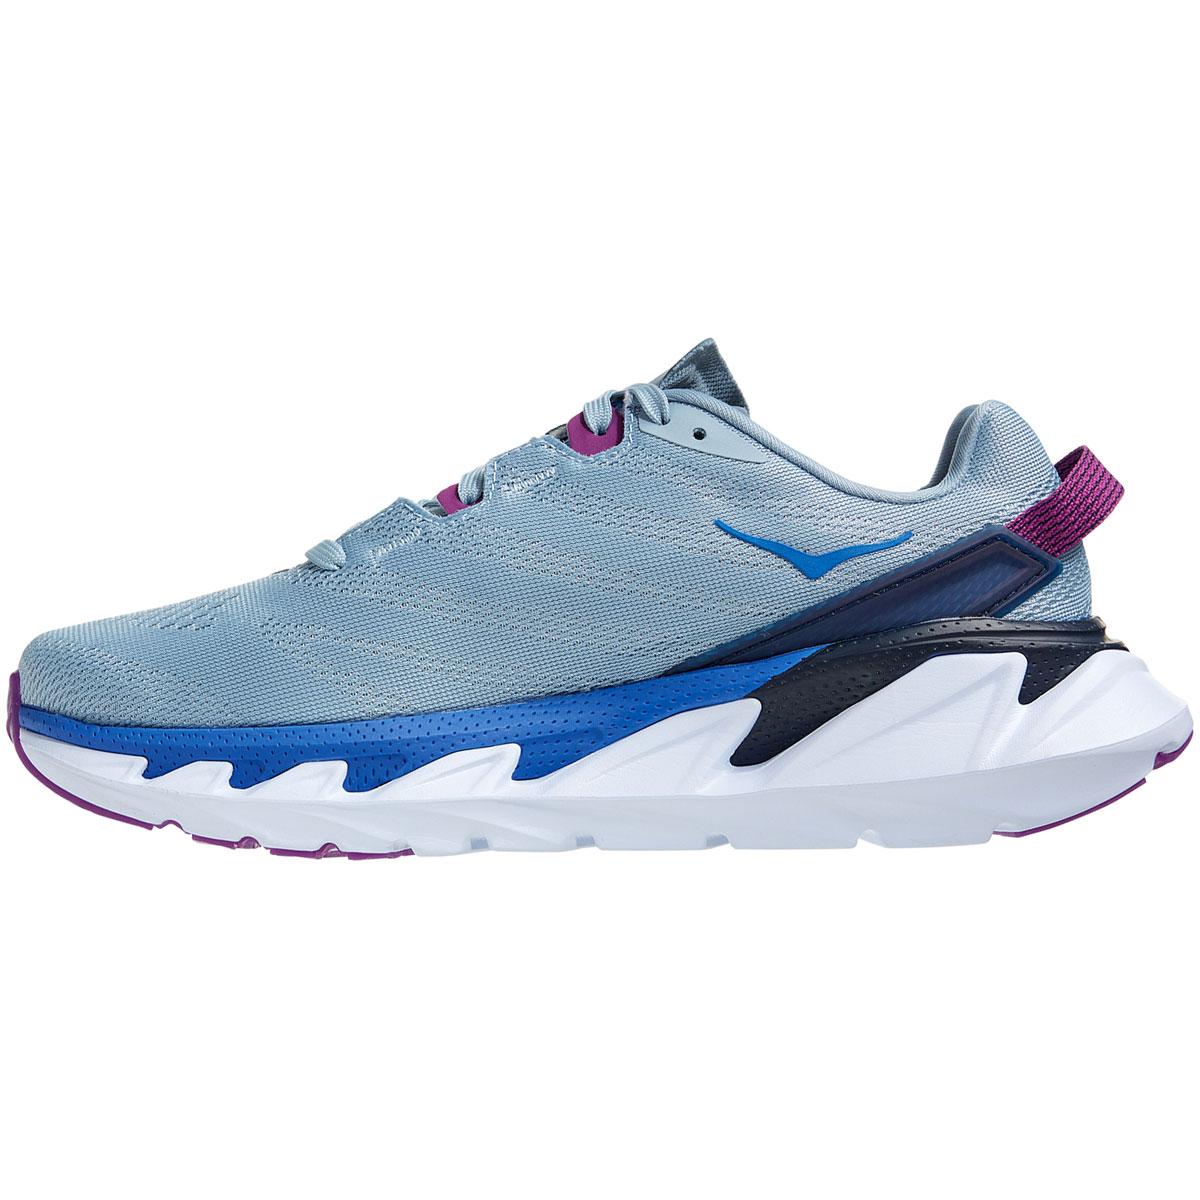 Women's Hoka One One Elevon 2 Running Shoe - Color: Ballad Blue - Size: 5 - Width: Regular, Ballad Blue, large, image 2